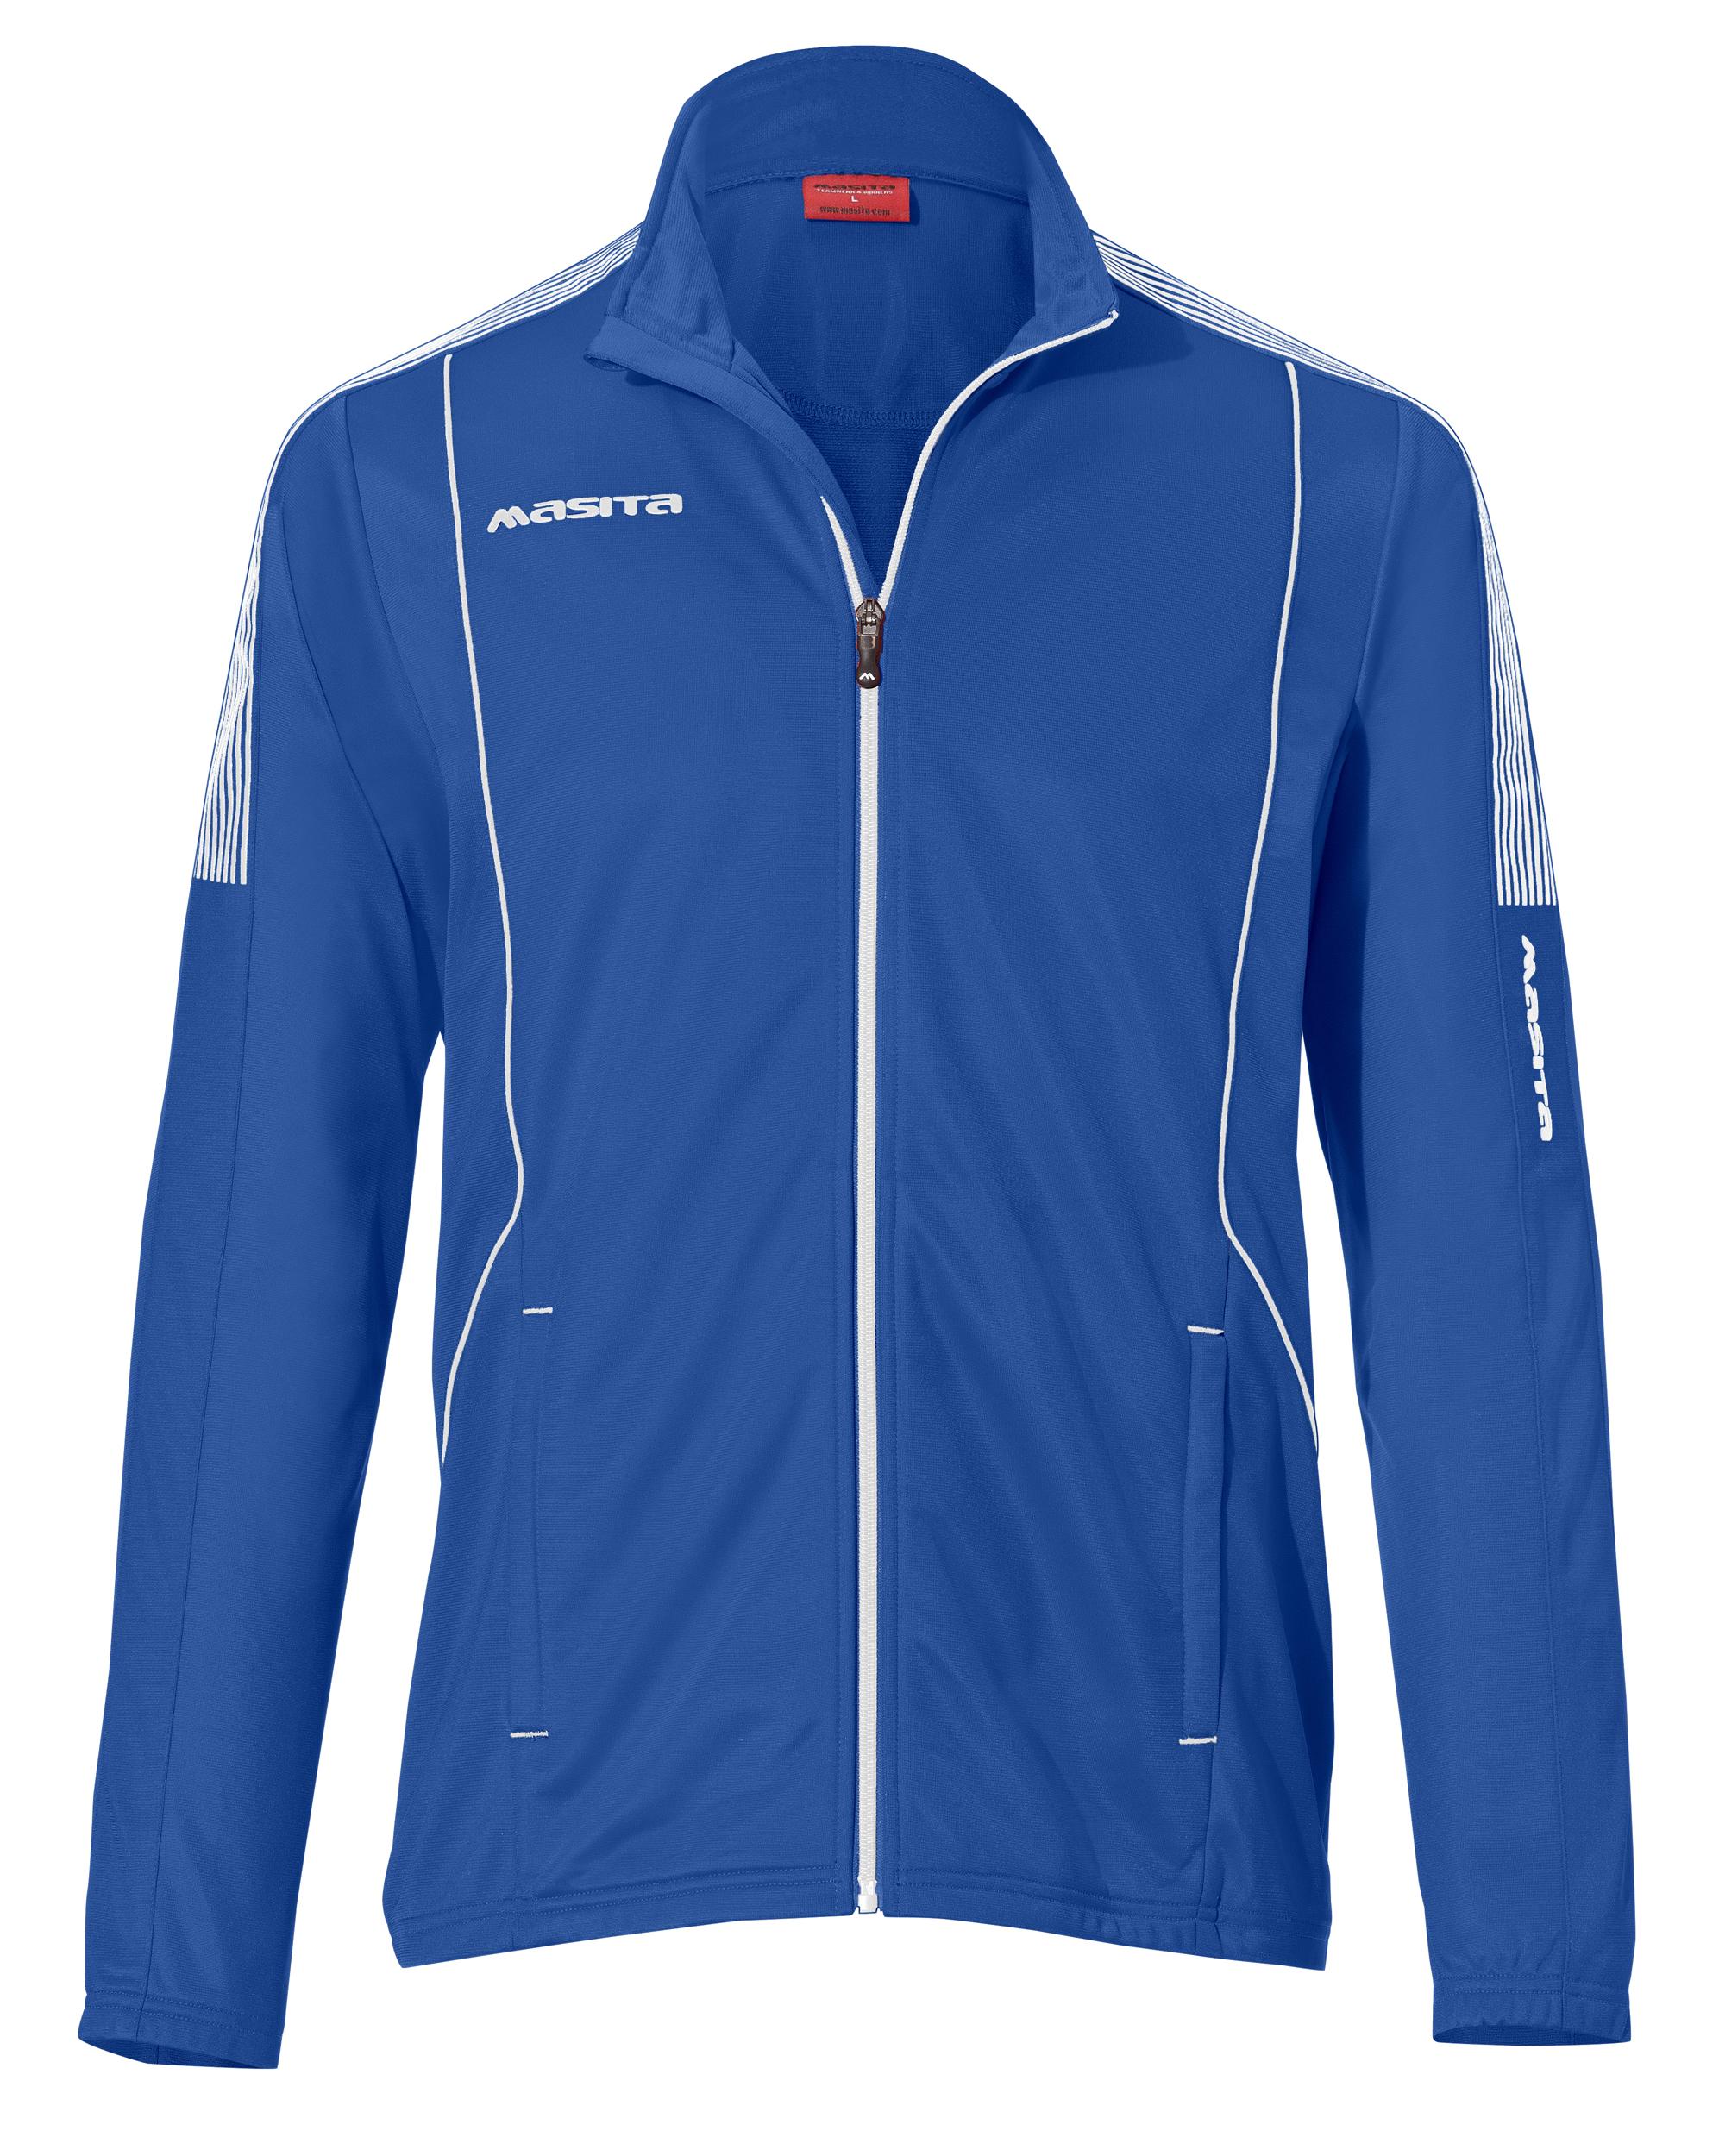 Polyester Jacket Barca  Royal Blue / White